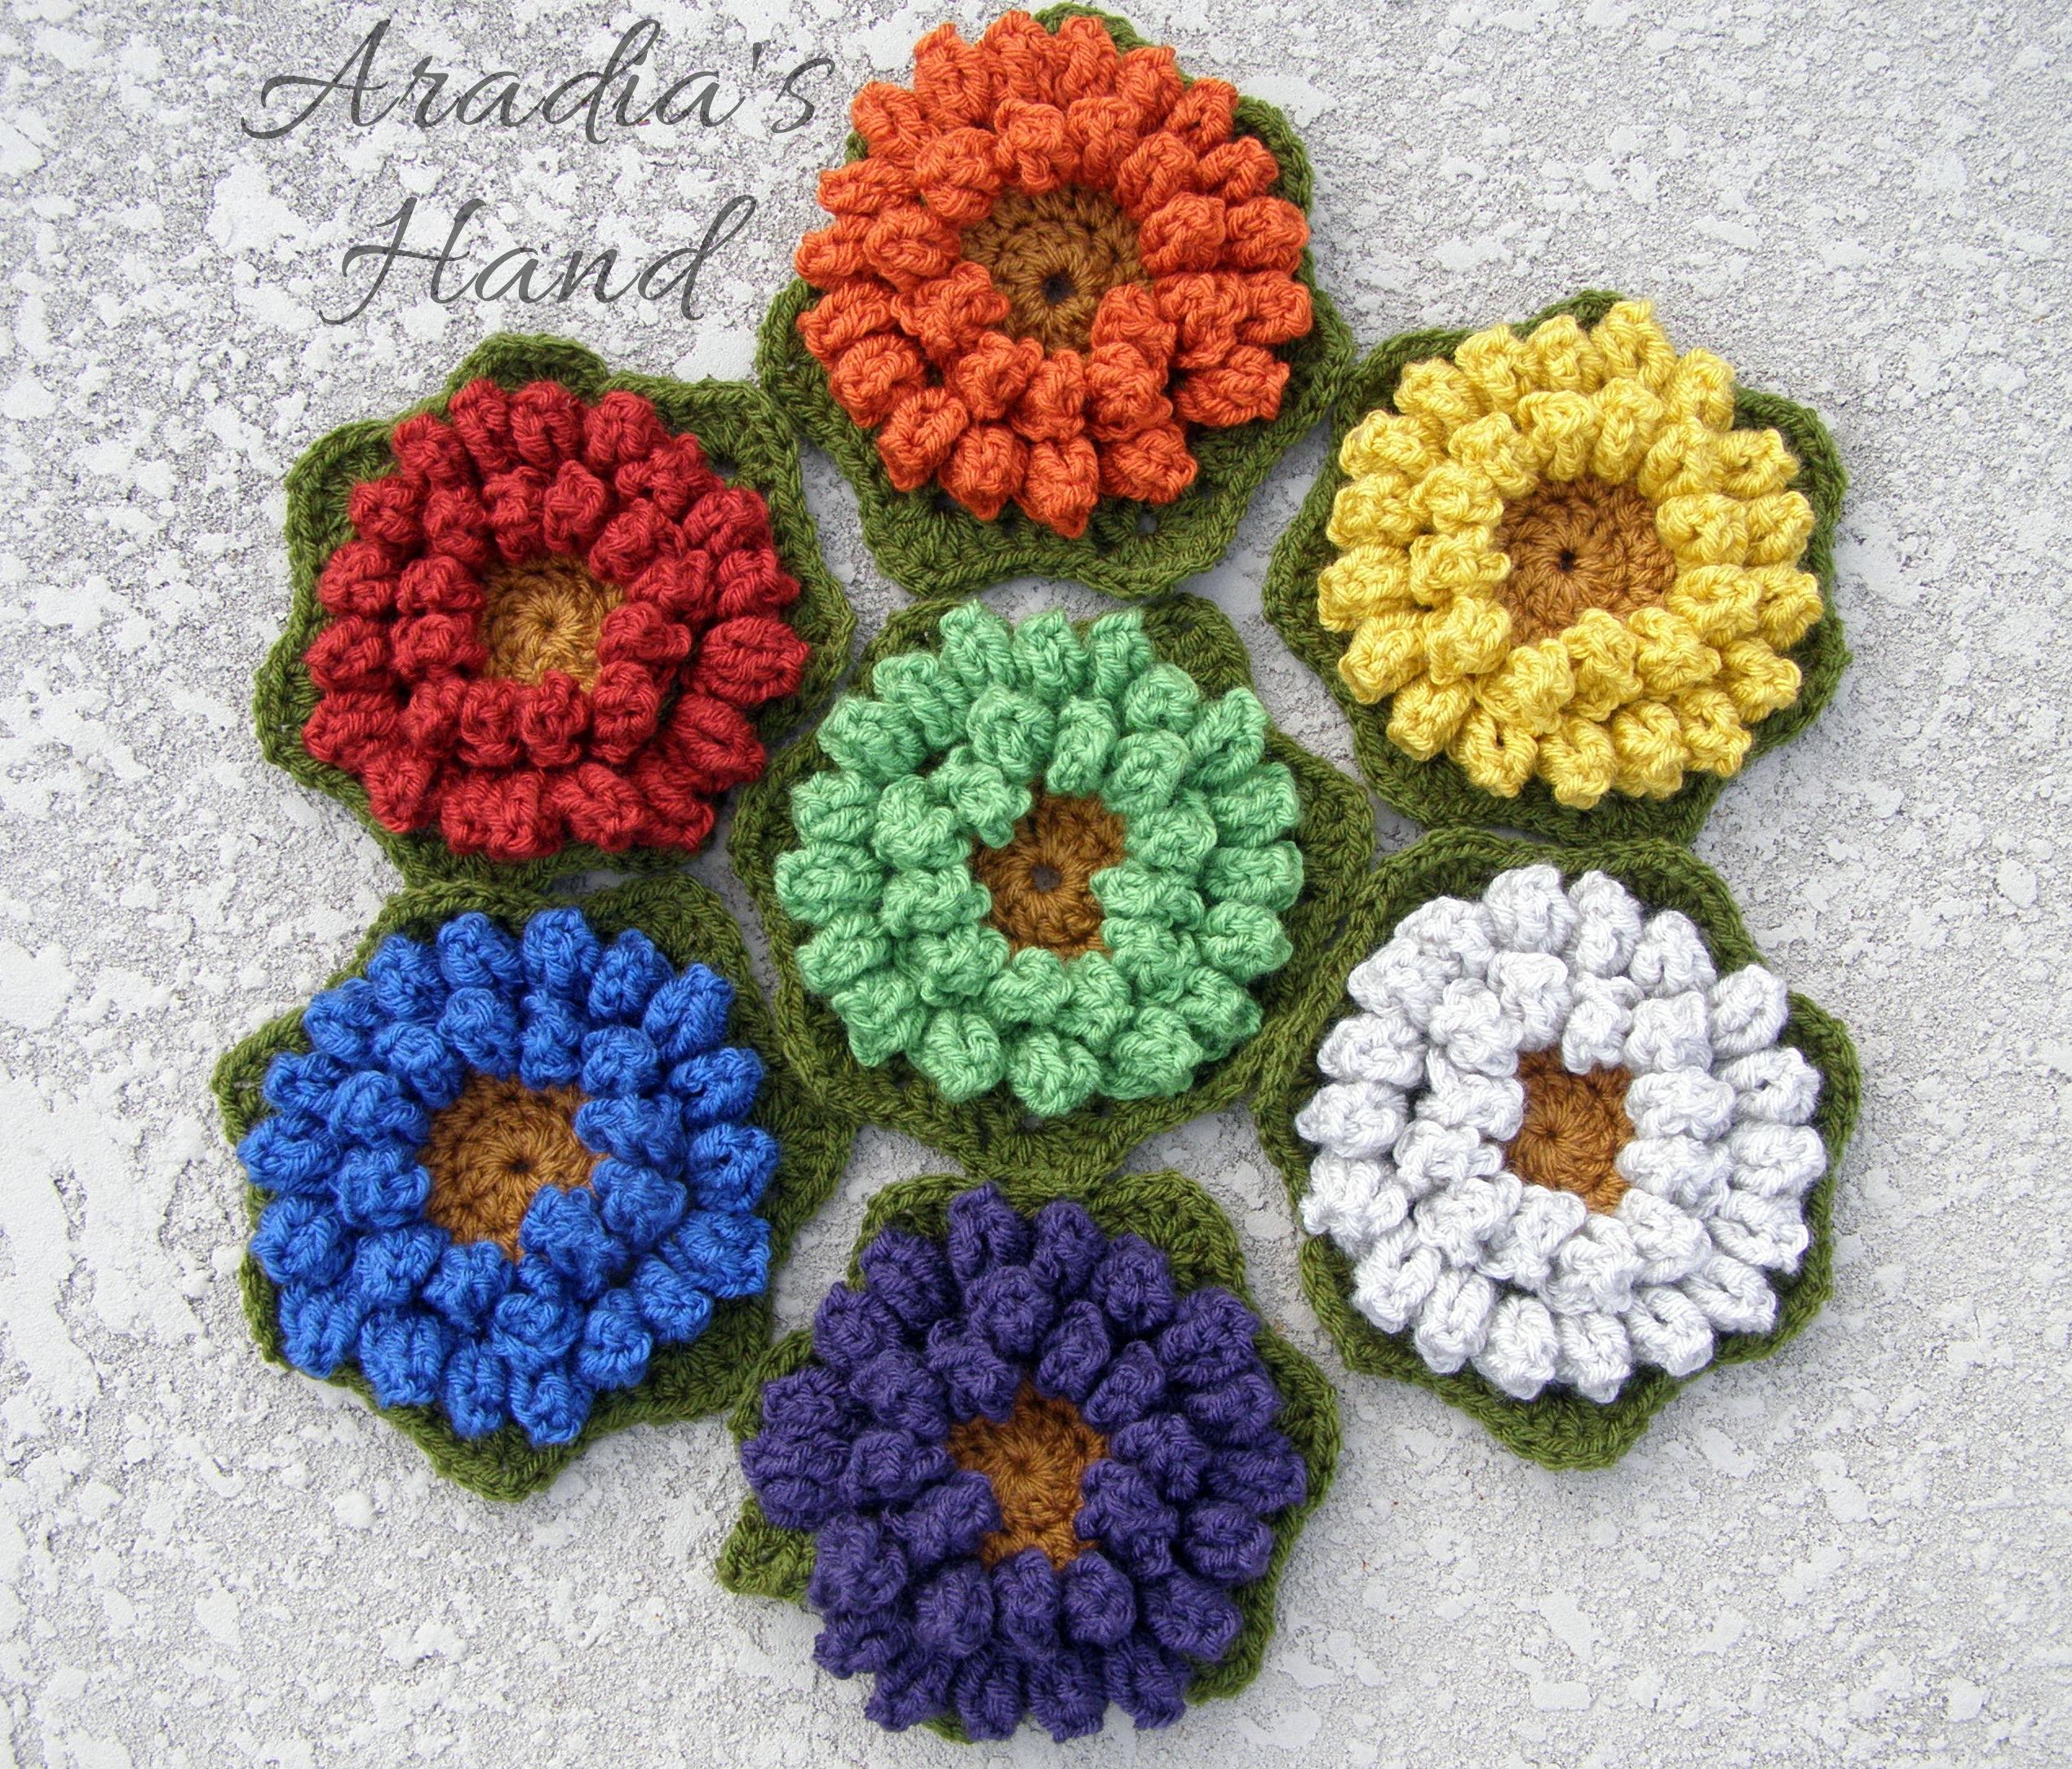 Aradias Hand Seven Chakra Lotus Flower Stone Home Set Online